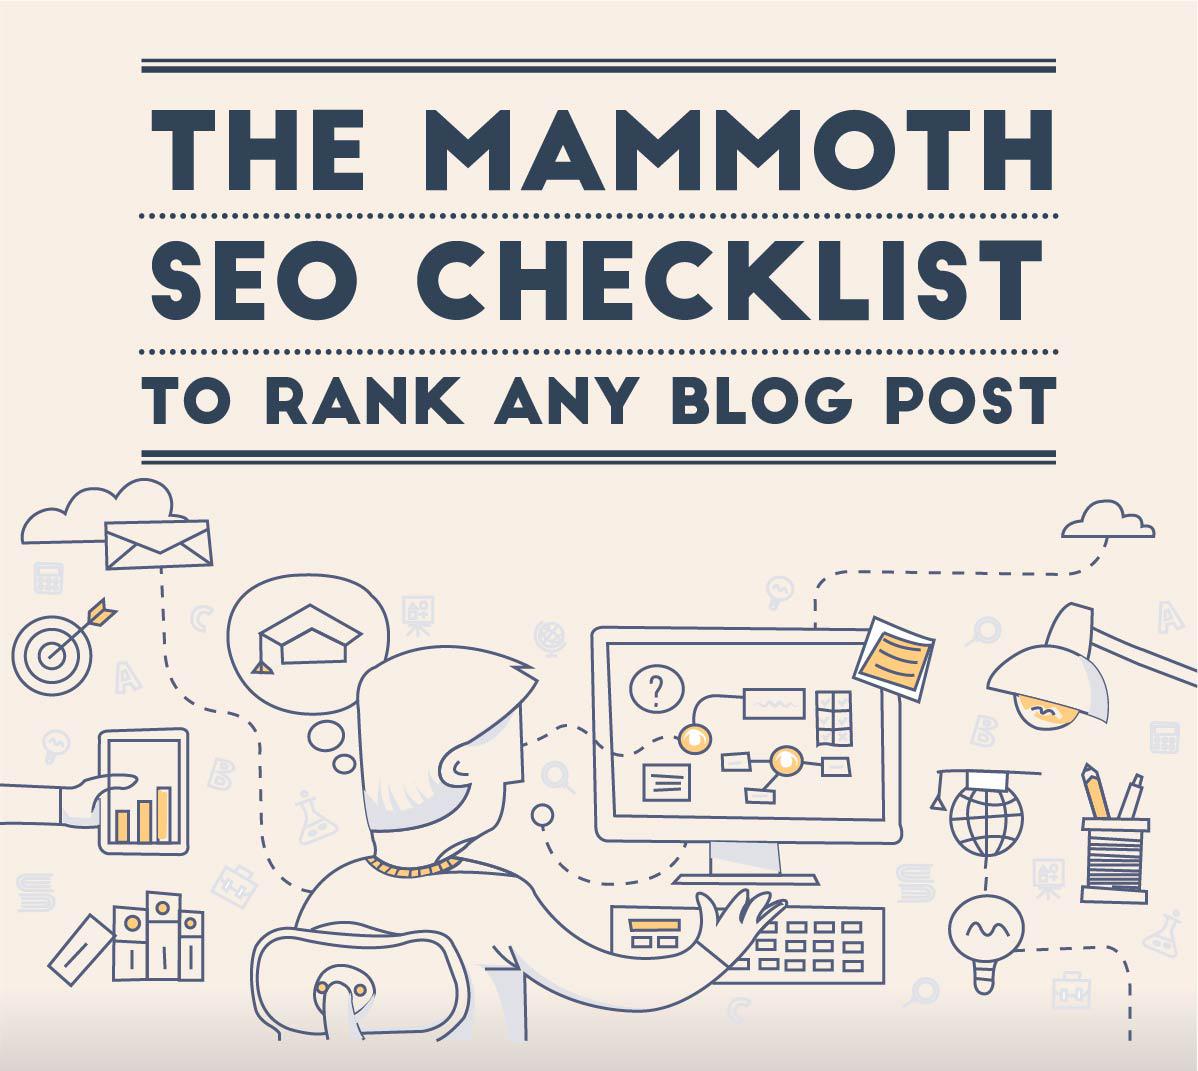 CU] SEO For Blogs Checklist